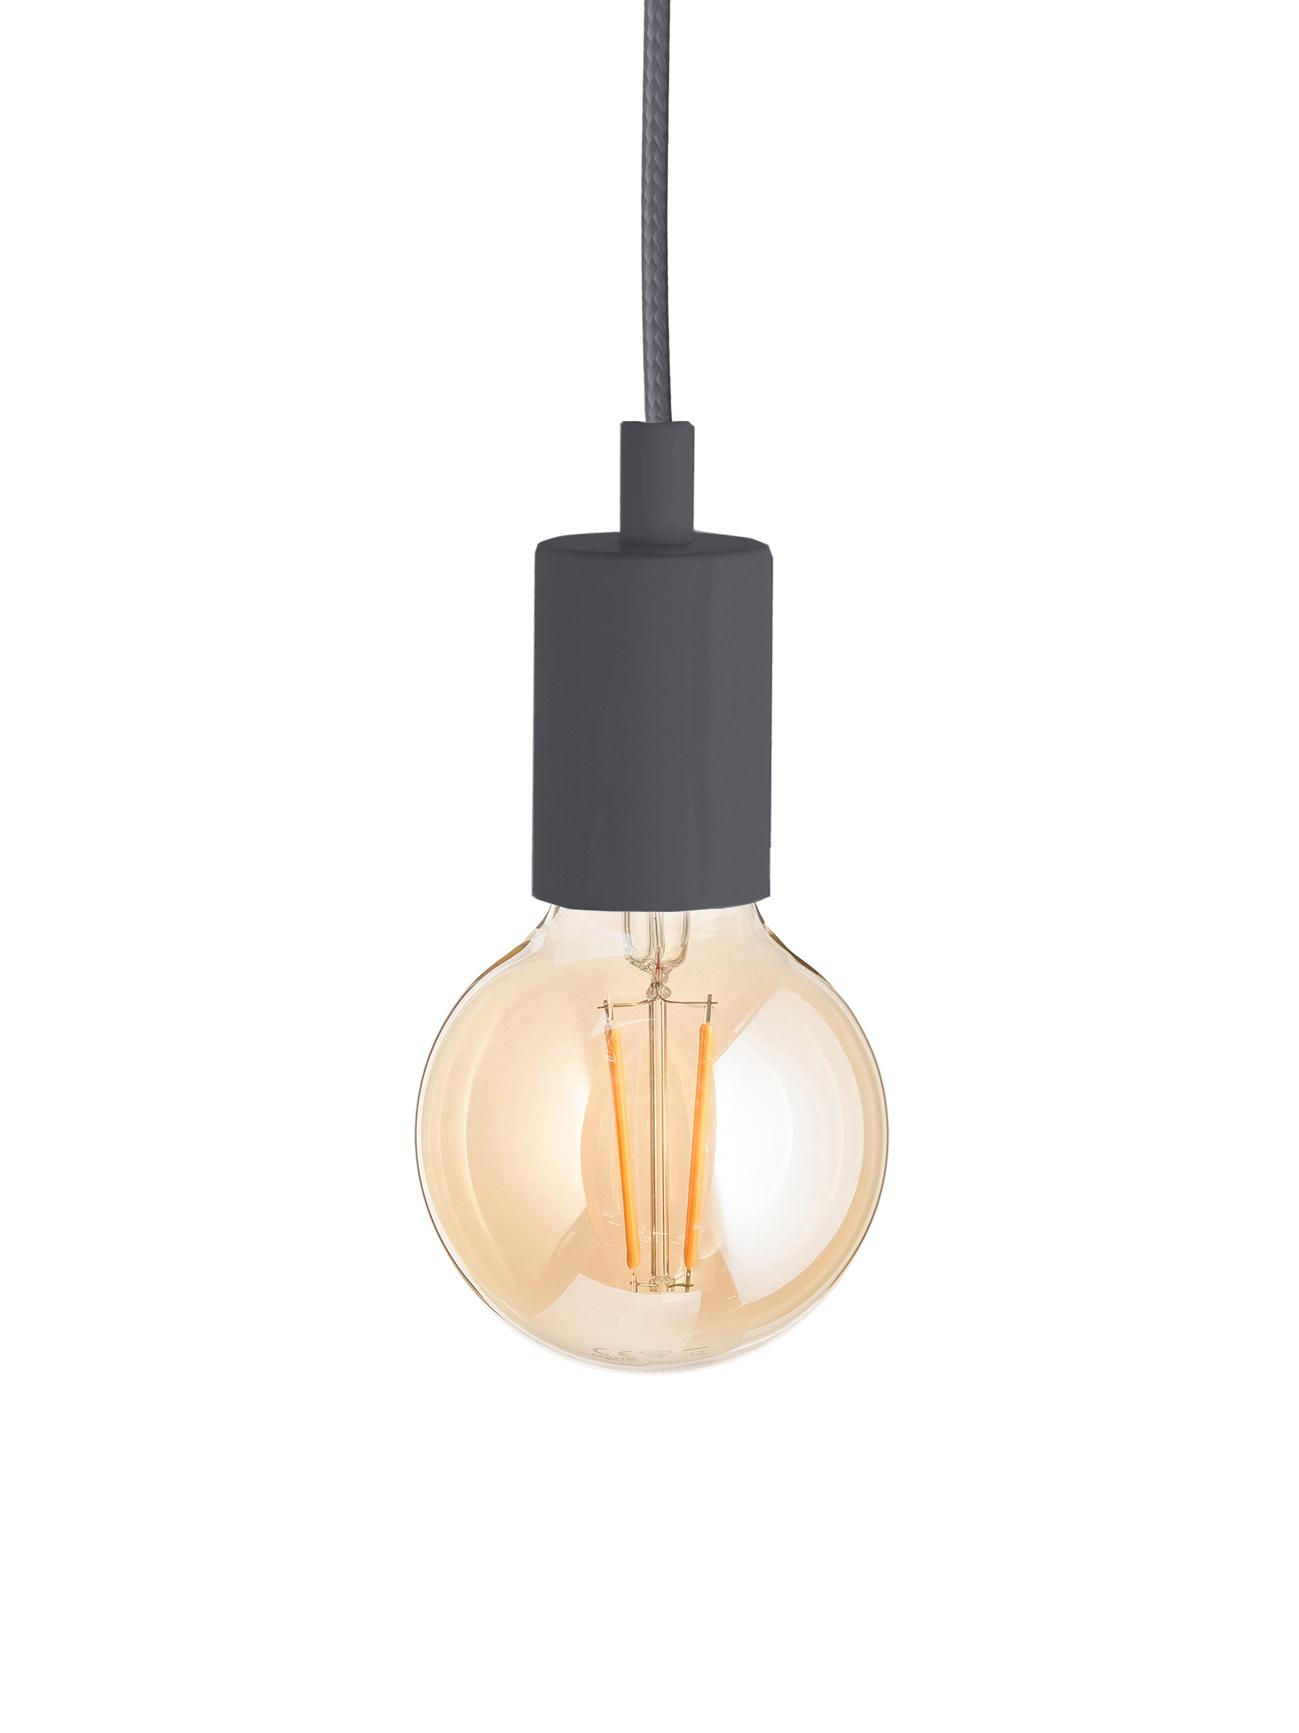 Lampada a sospensione Color, Grigio, Ø 5 x Alt. 6 cm